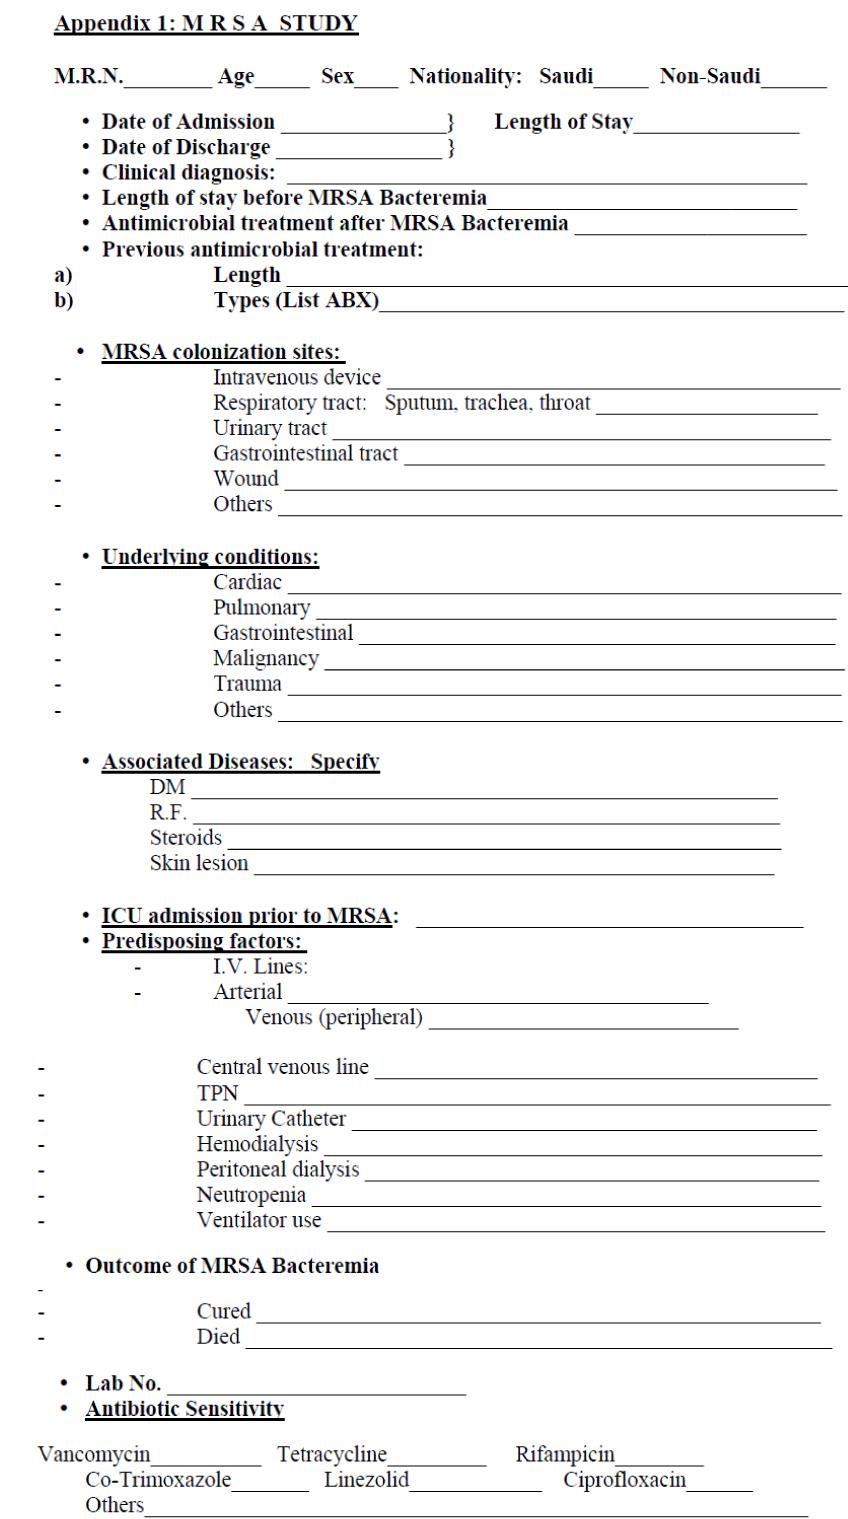 biomedres-STUDY